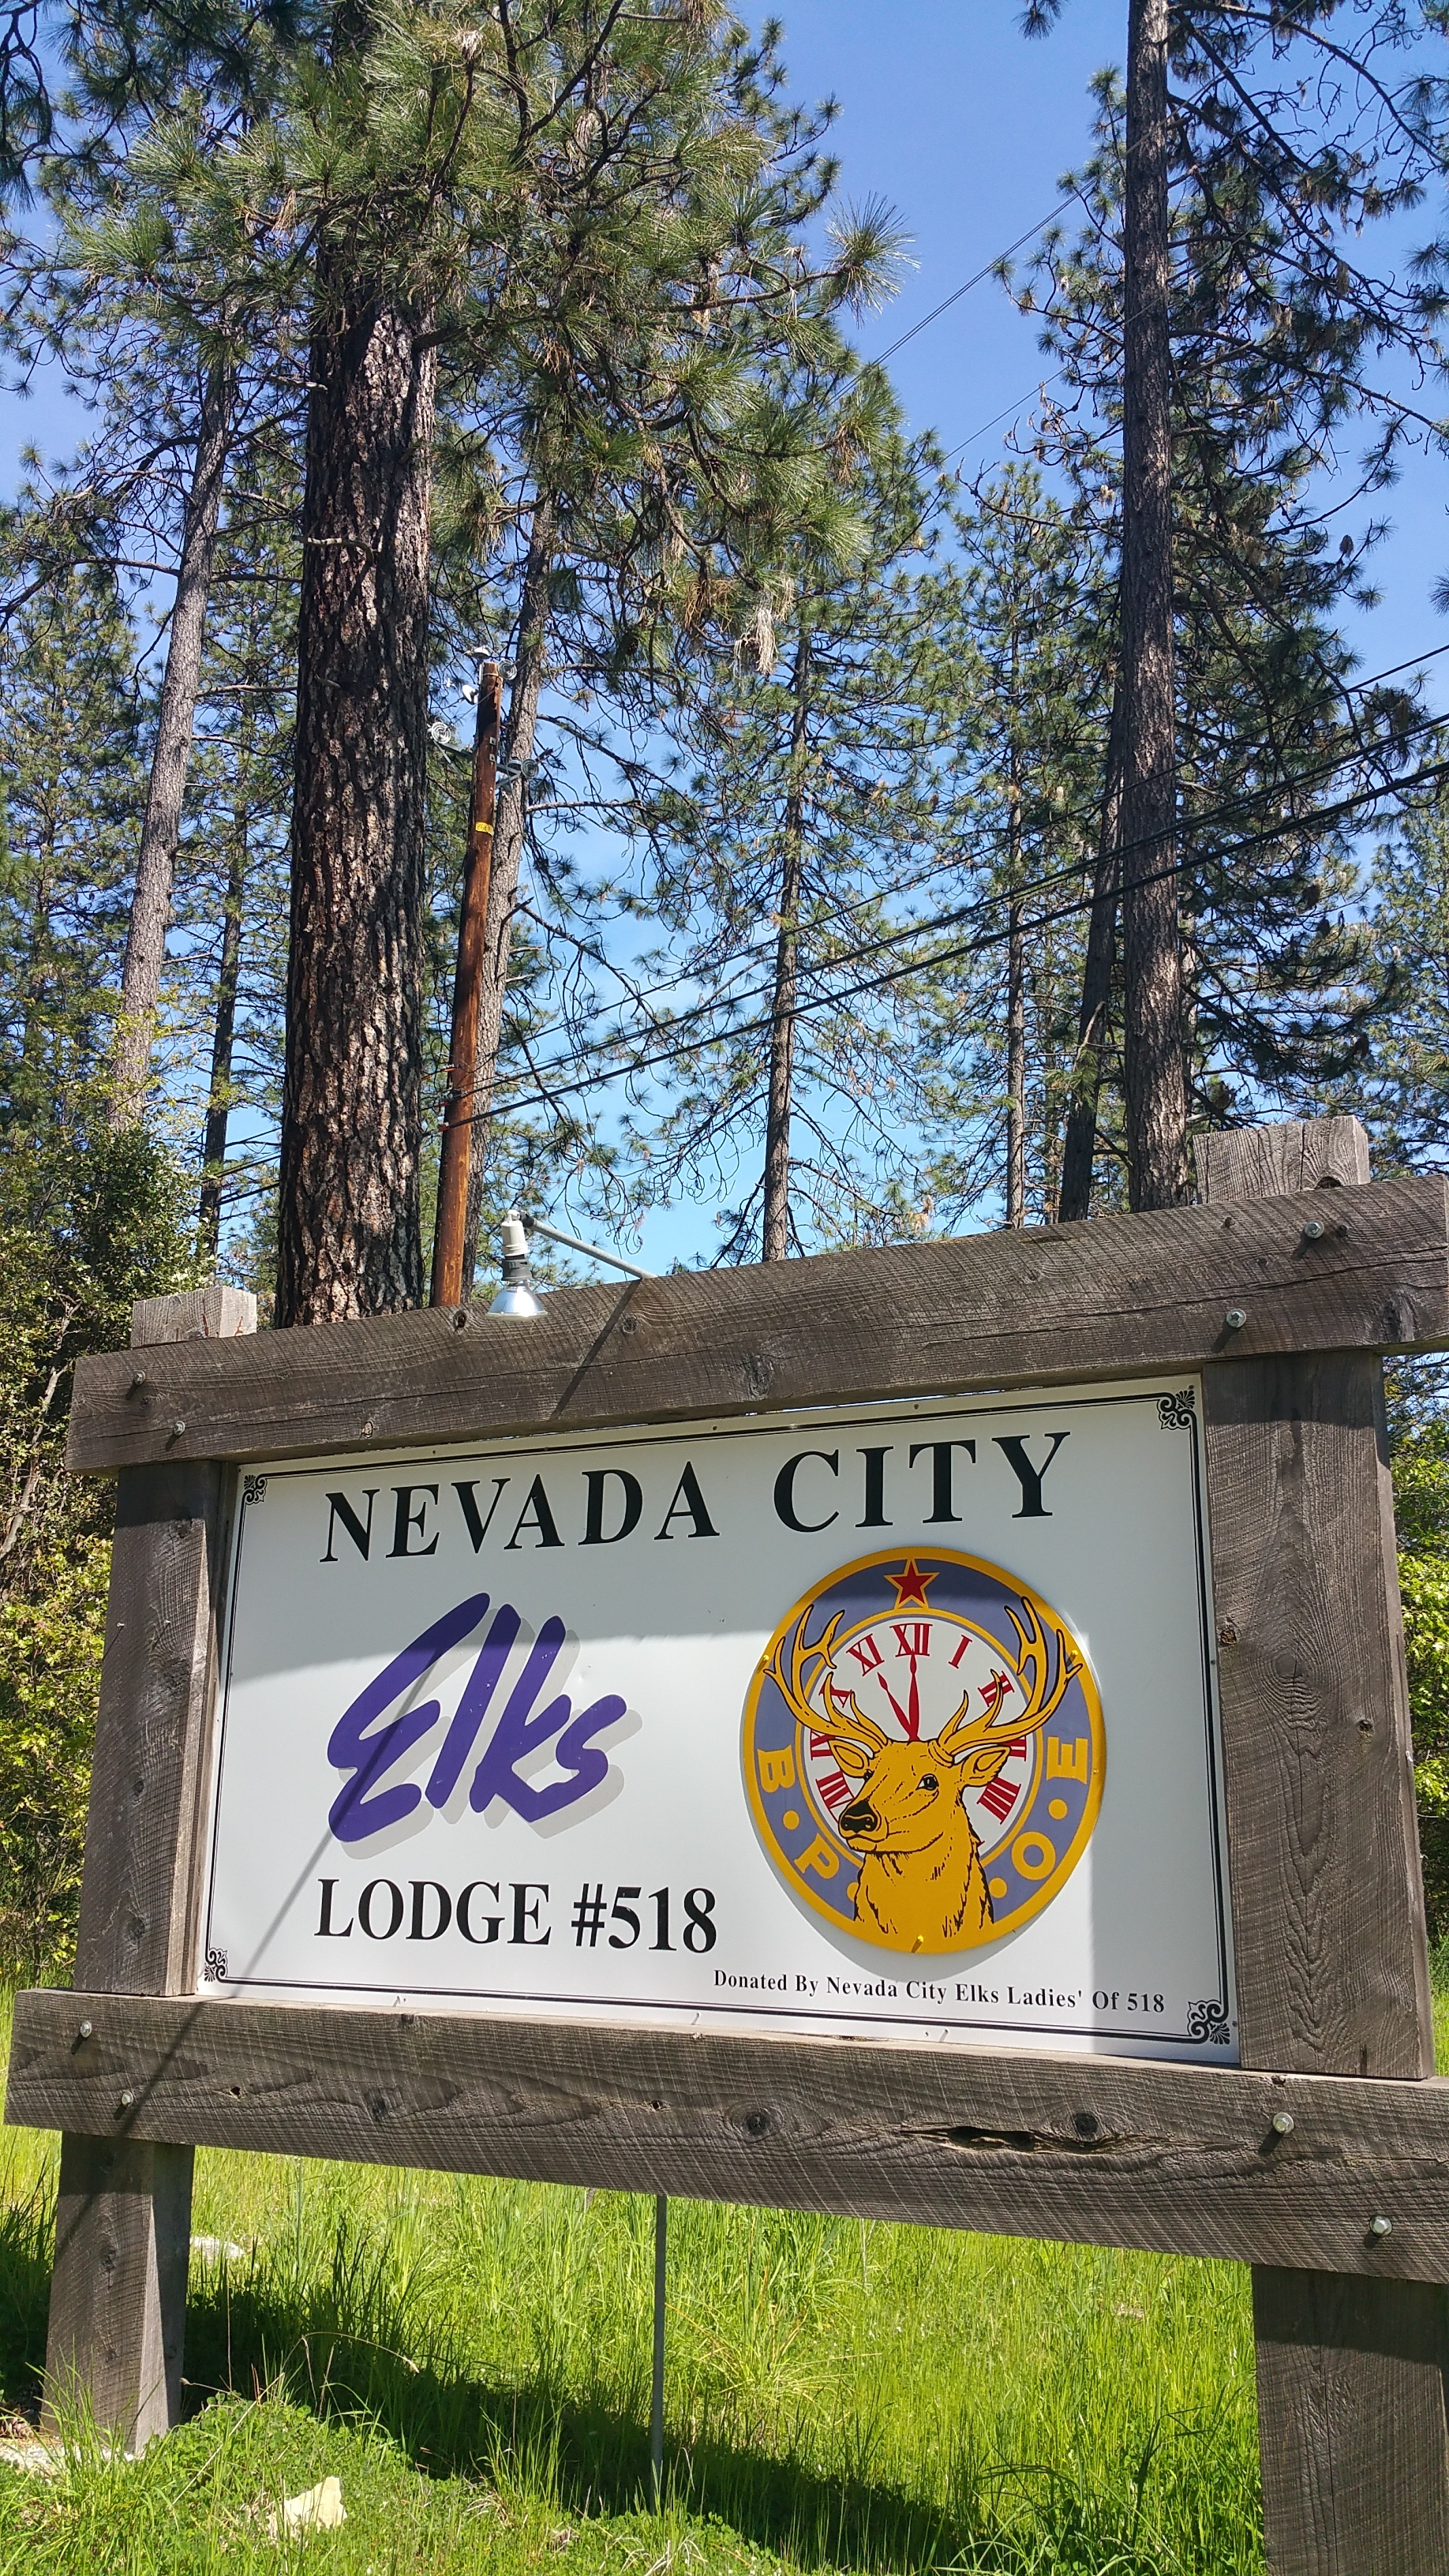 Nevada City Elks Club